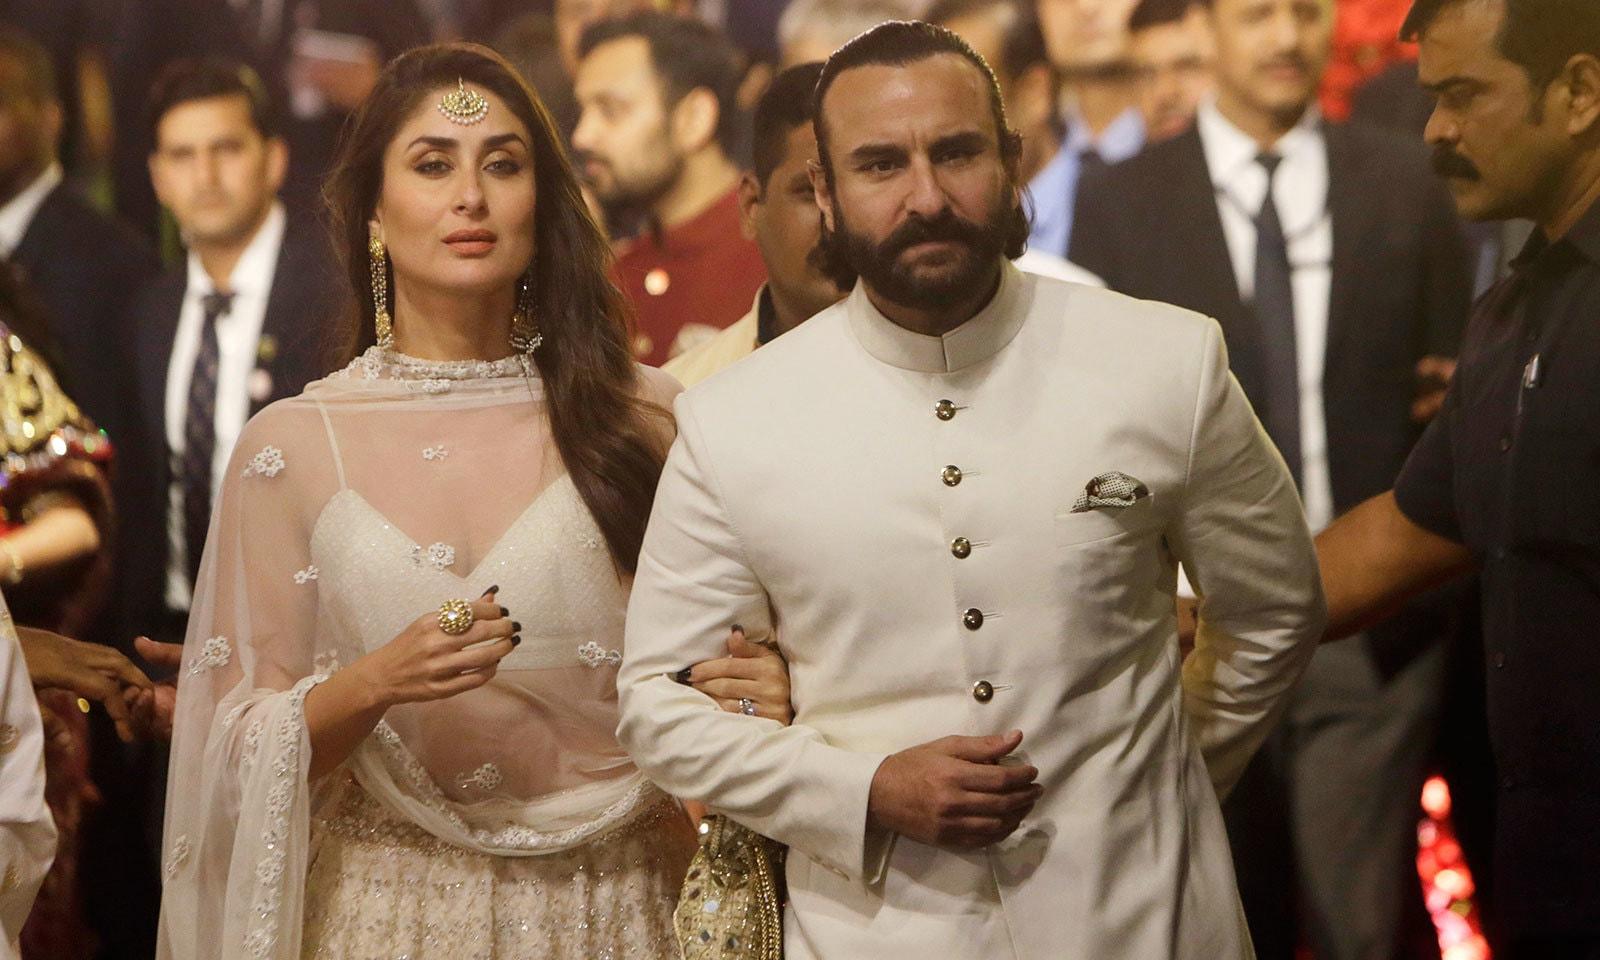 saif ali khan and kareena kapoor - HD3900×2848